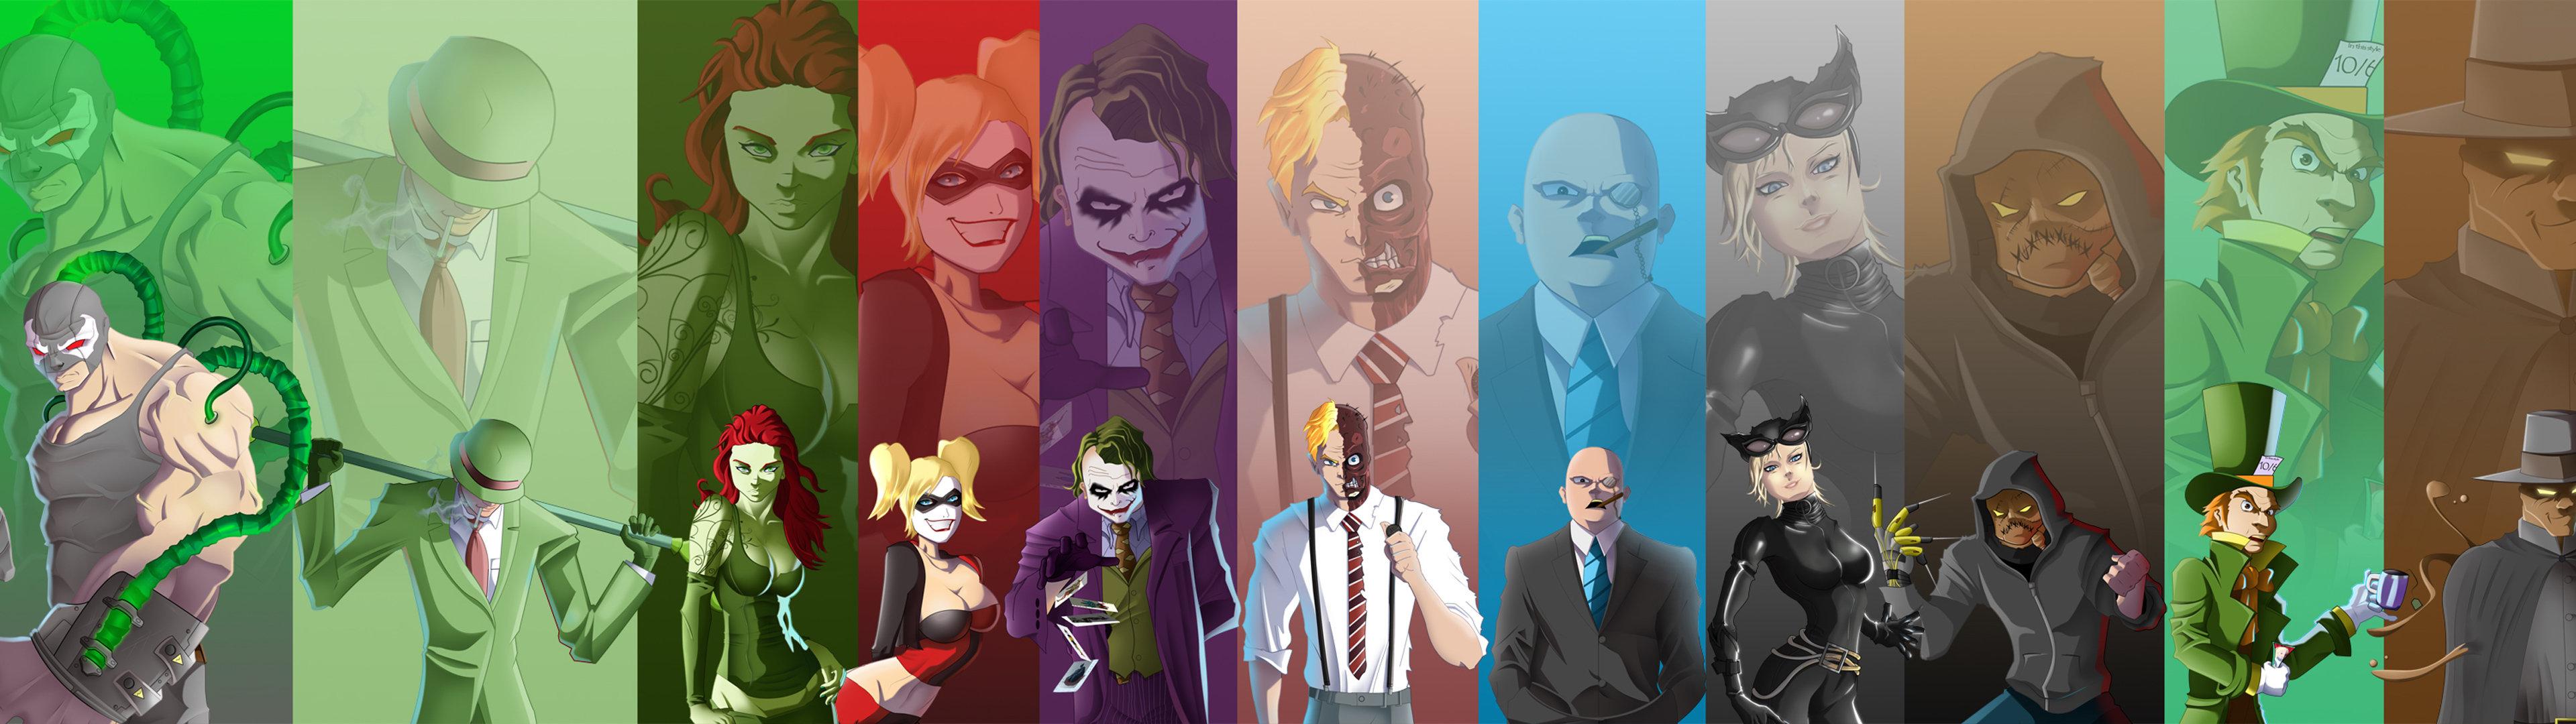 Dual Monitor Batman Wallpapers Hd Backgrounds